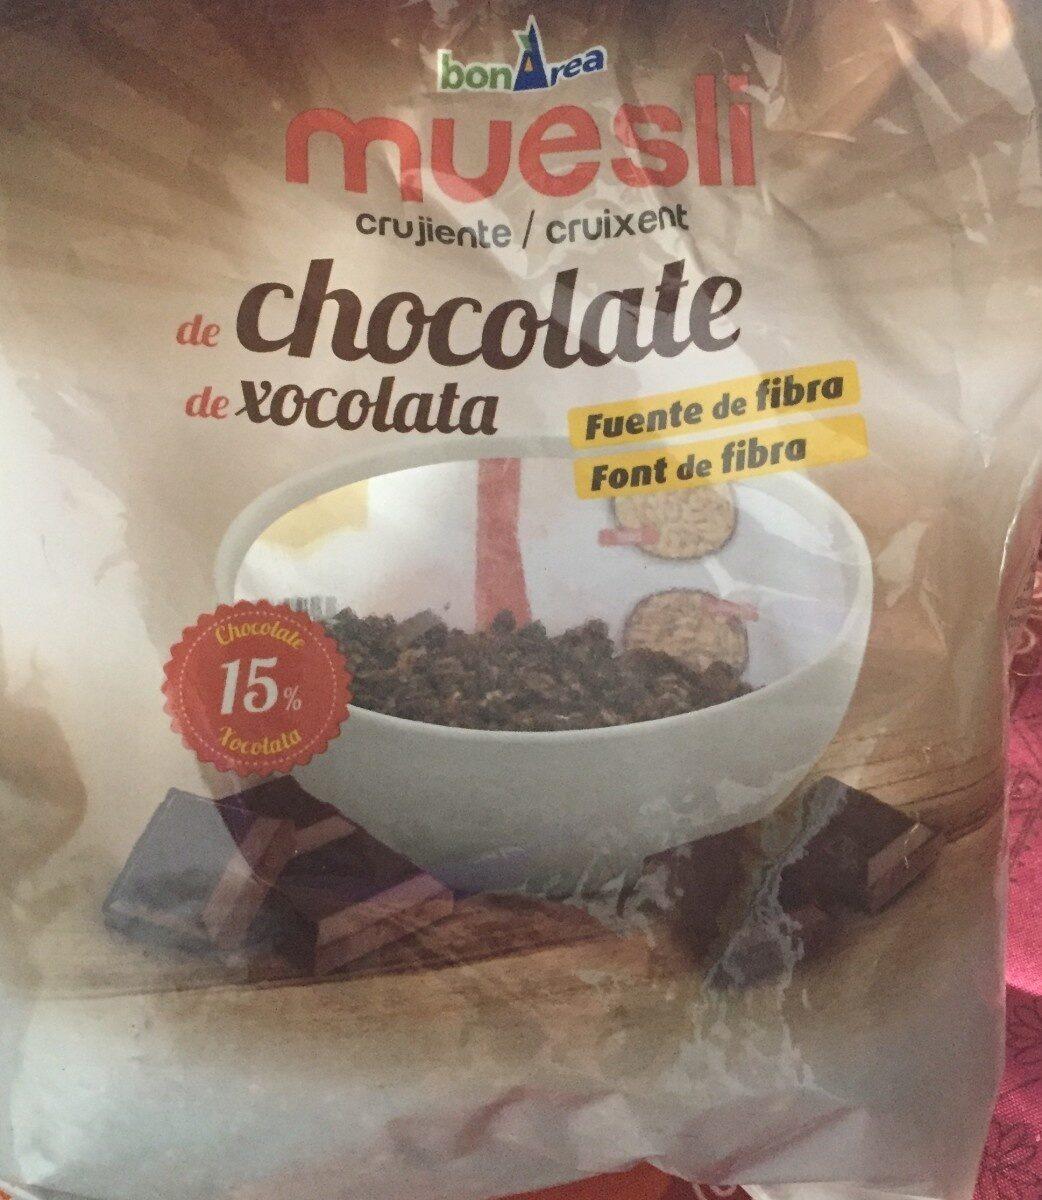 Muesli crujiente de chocolate - Product - es